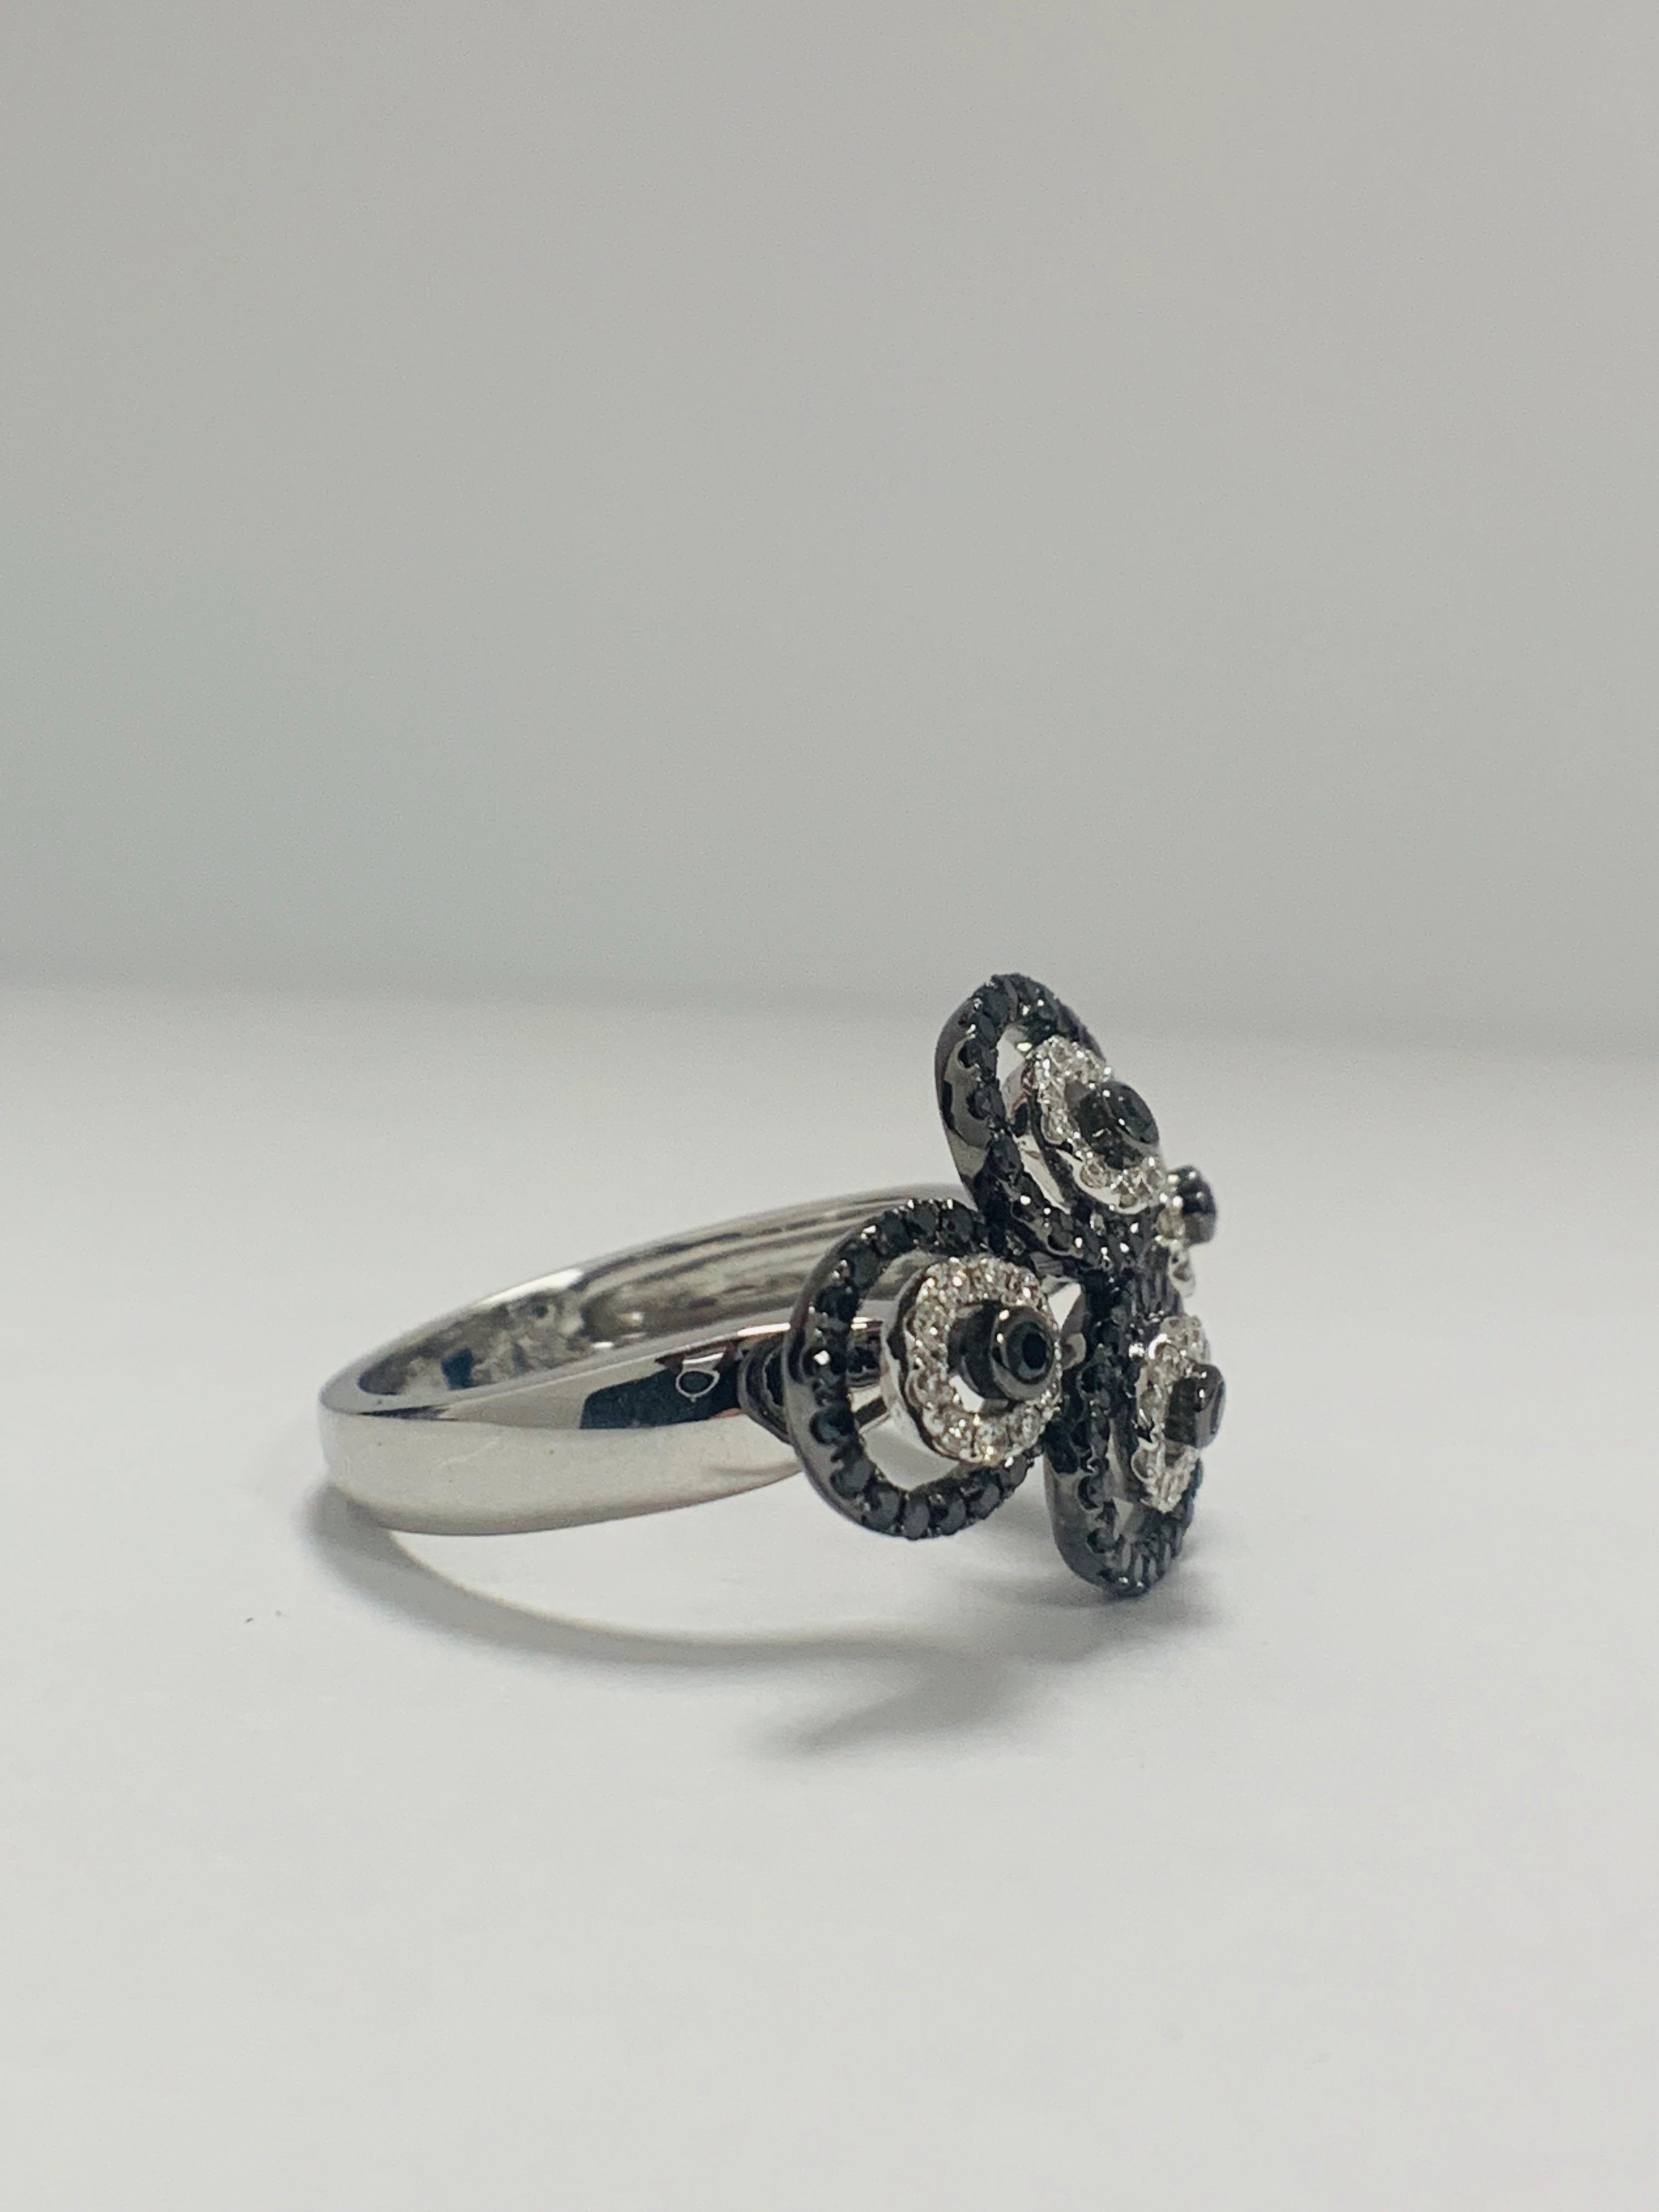 Lot 57 - 18ct White Gold Diamond Ring Featuring 80 Round Cut, Black Diamonds (0.61ct TBDW)